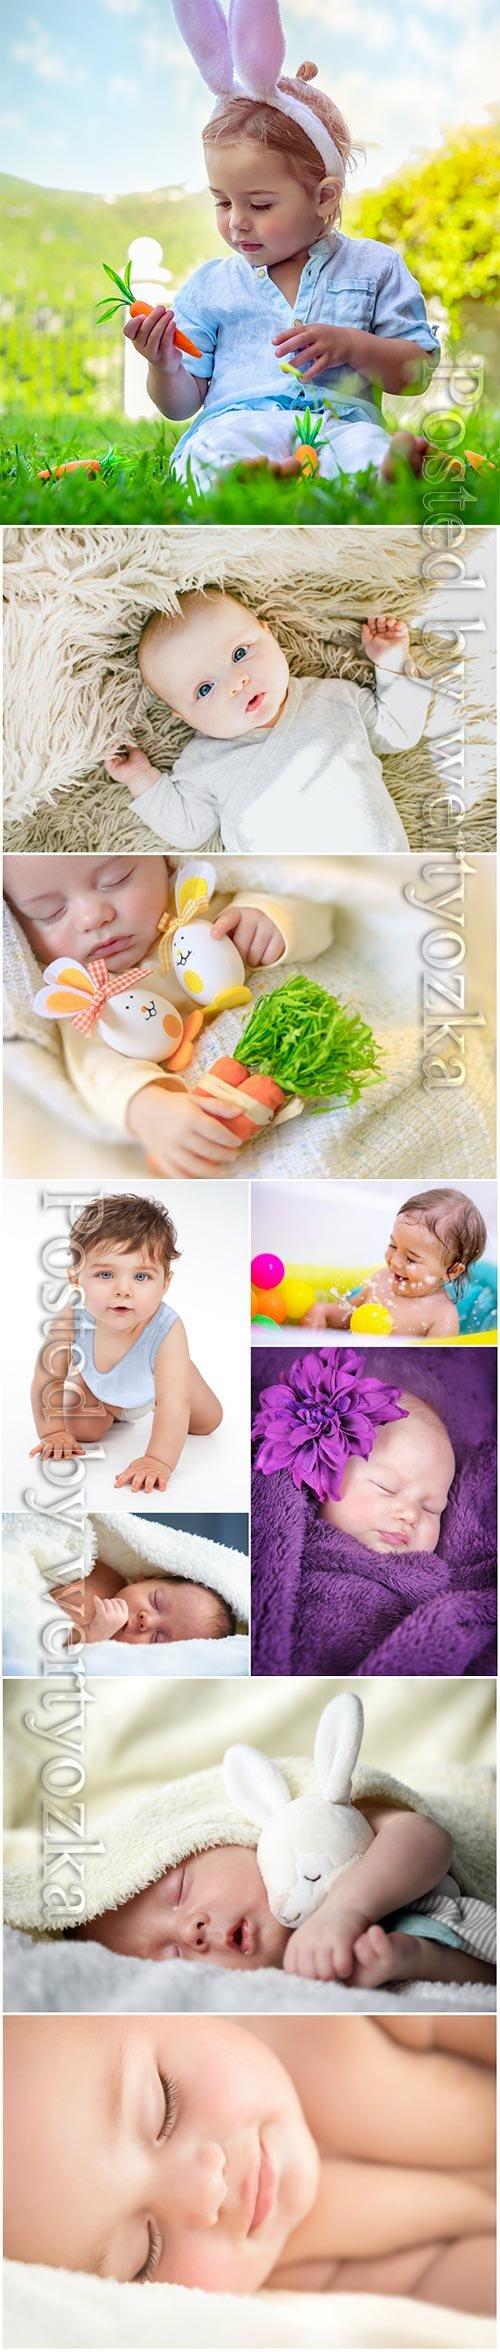 Funny little kids stock photo